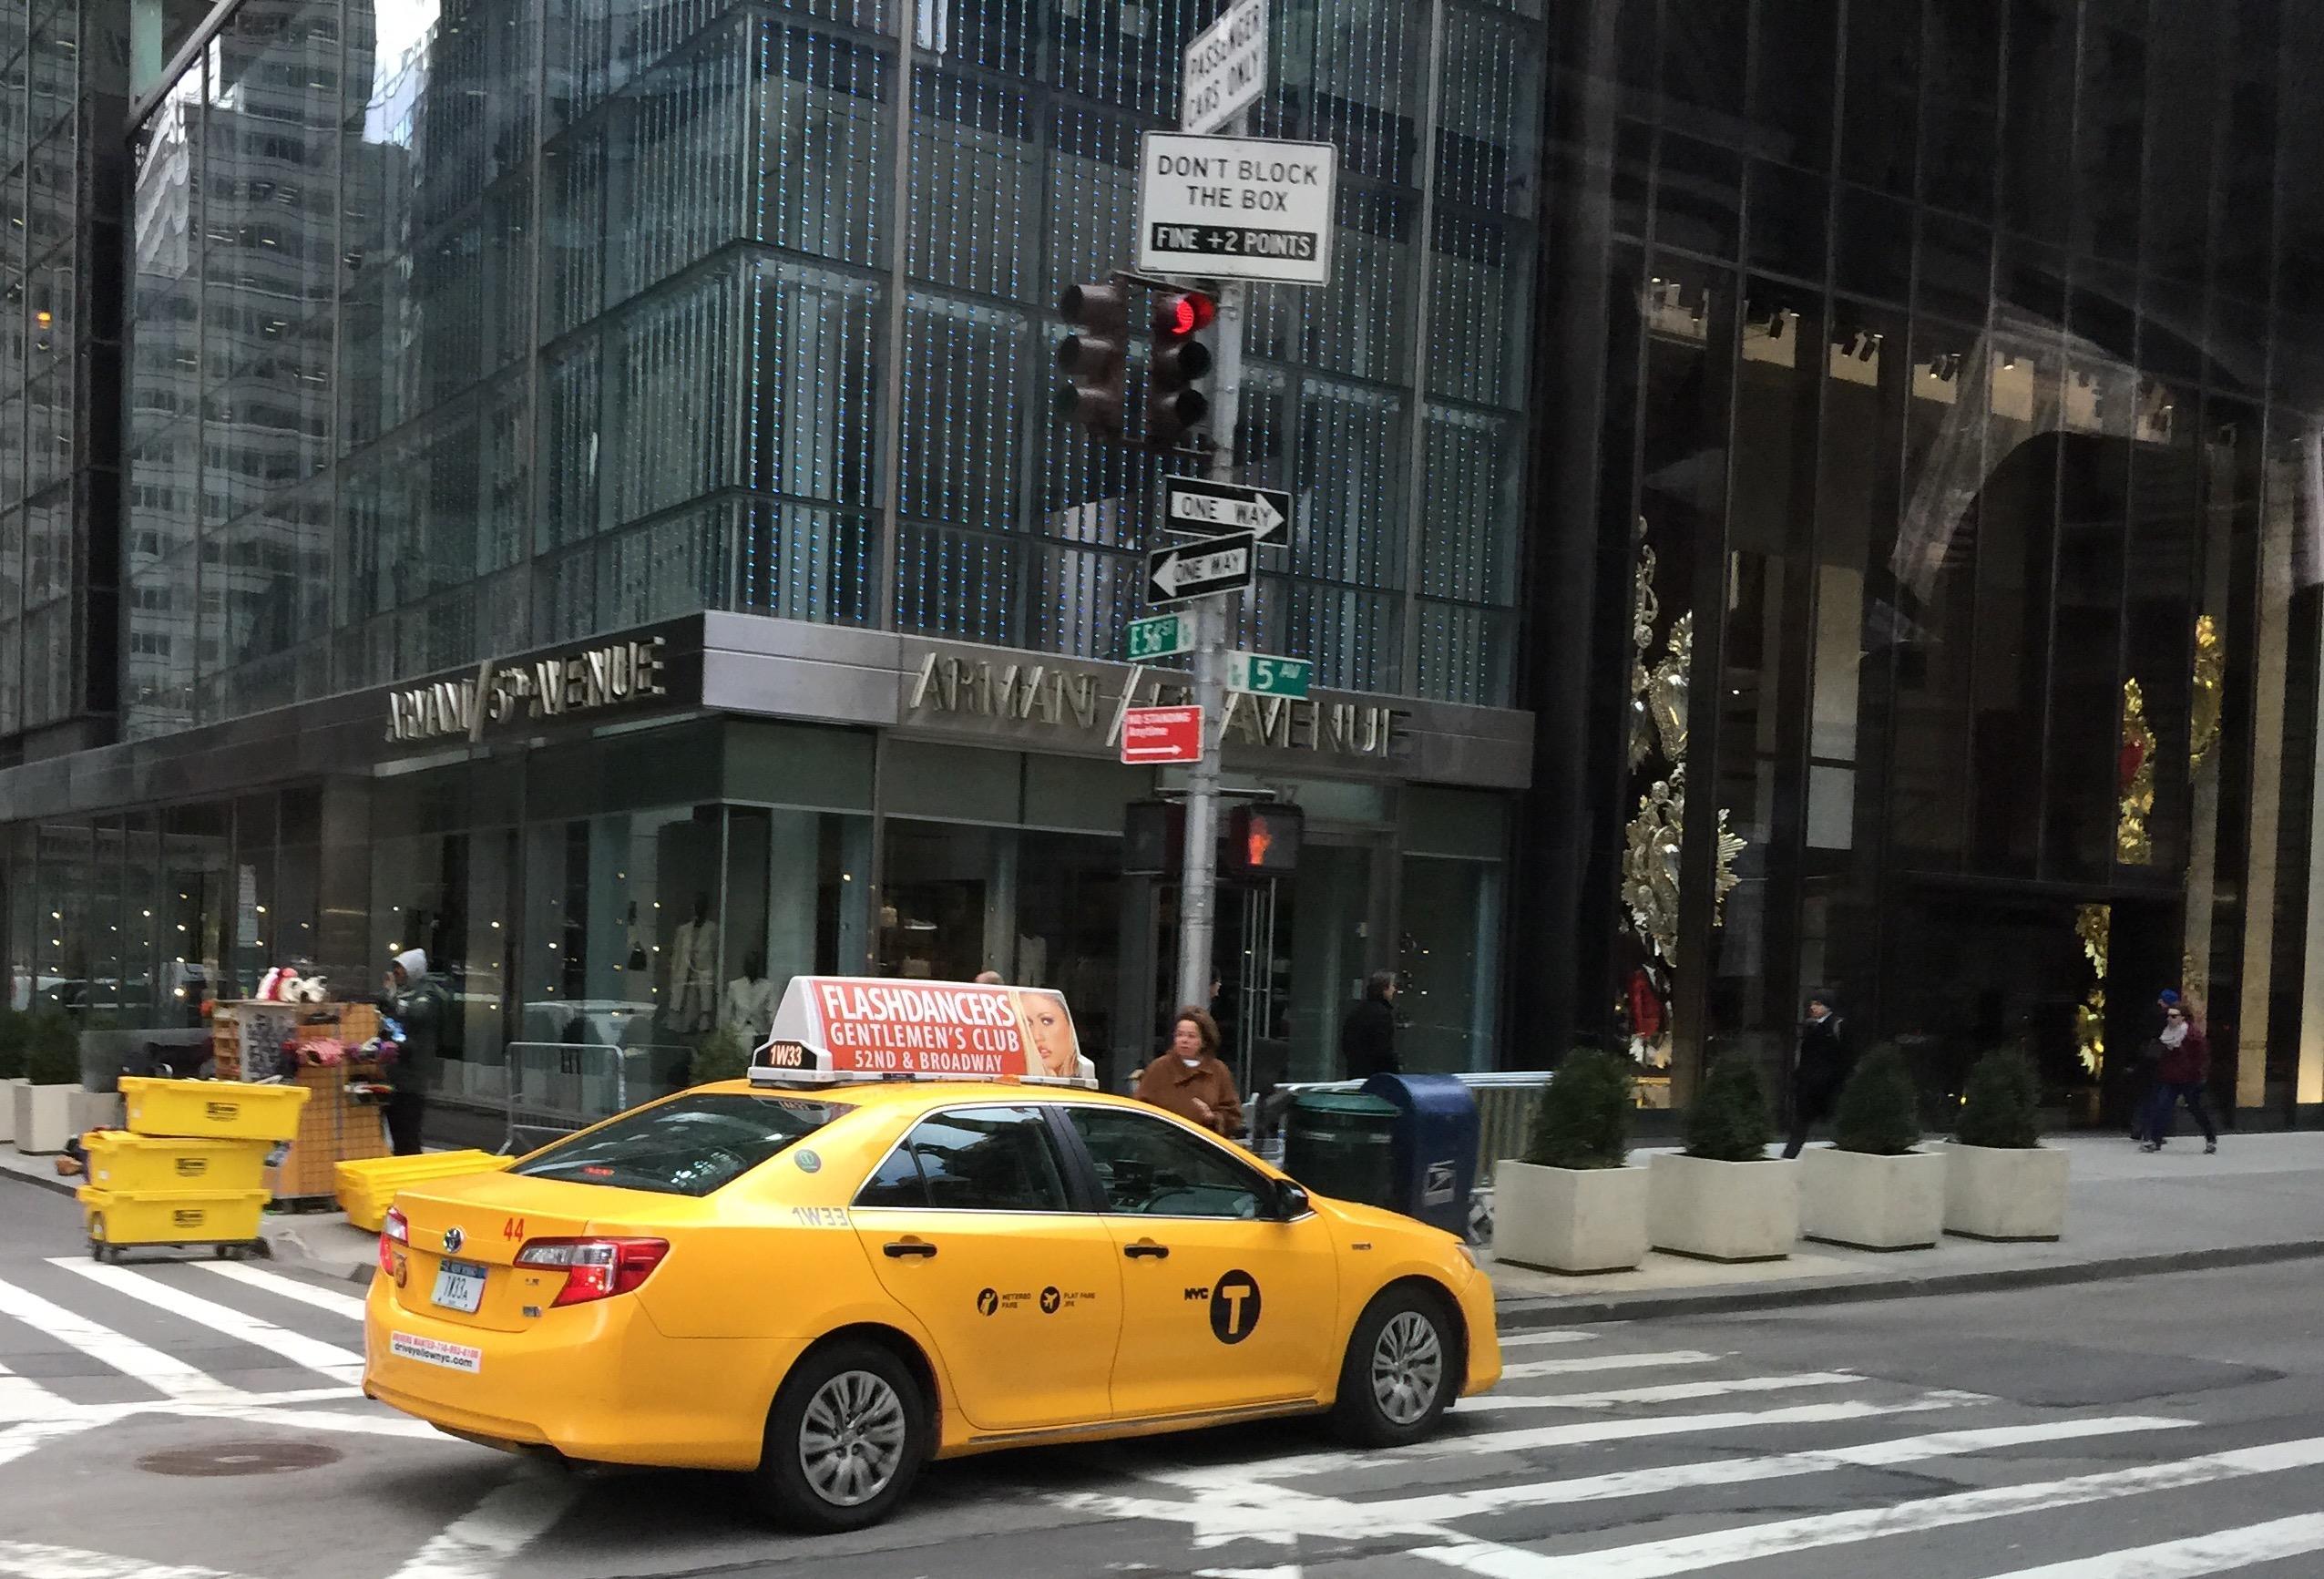 Taxi New York >> Free Images : cab, new york, metropolitan area, taxi ...